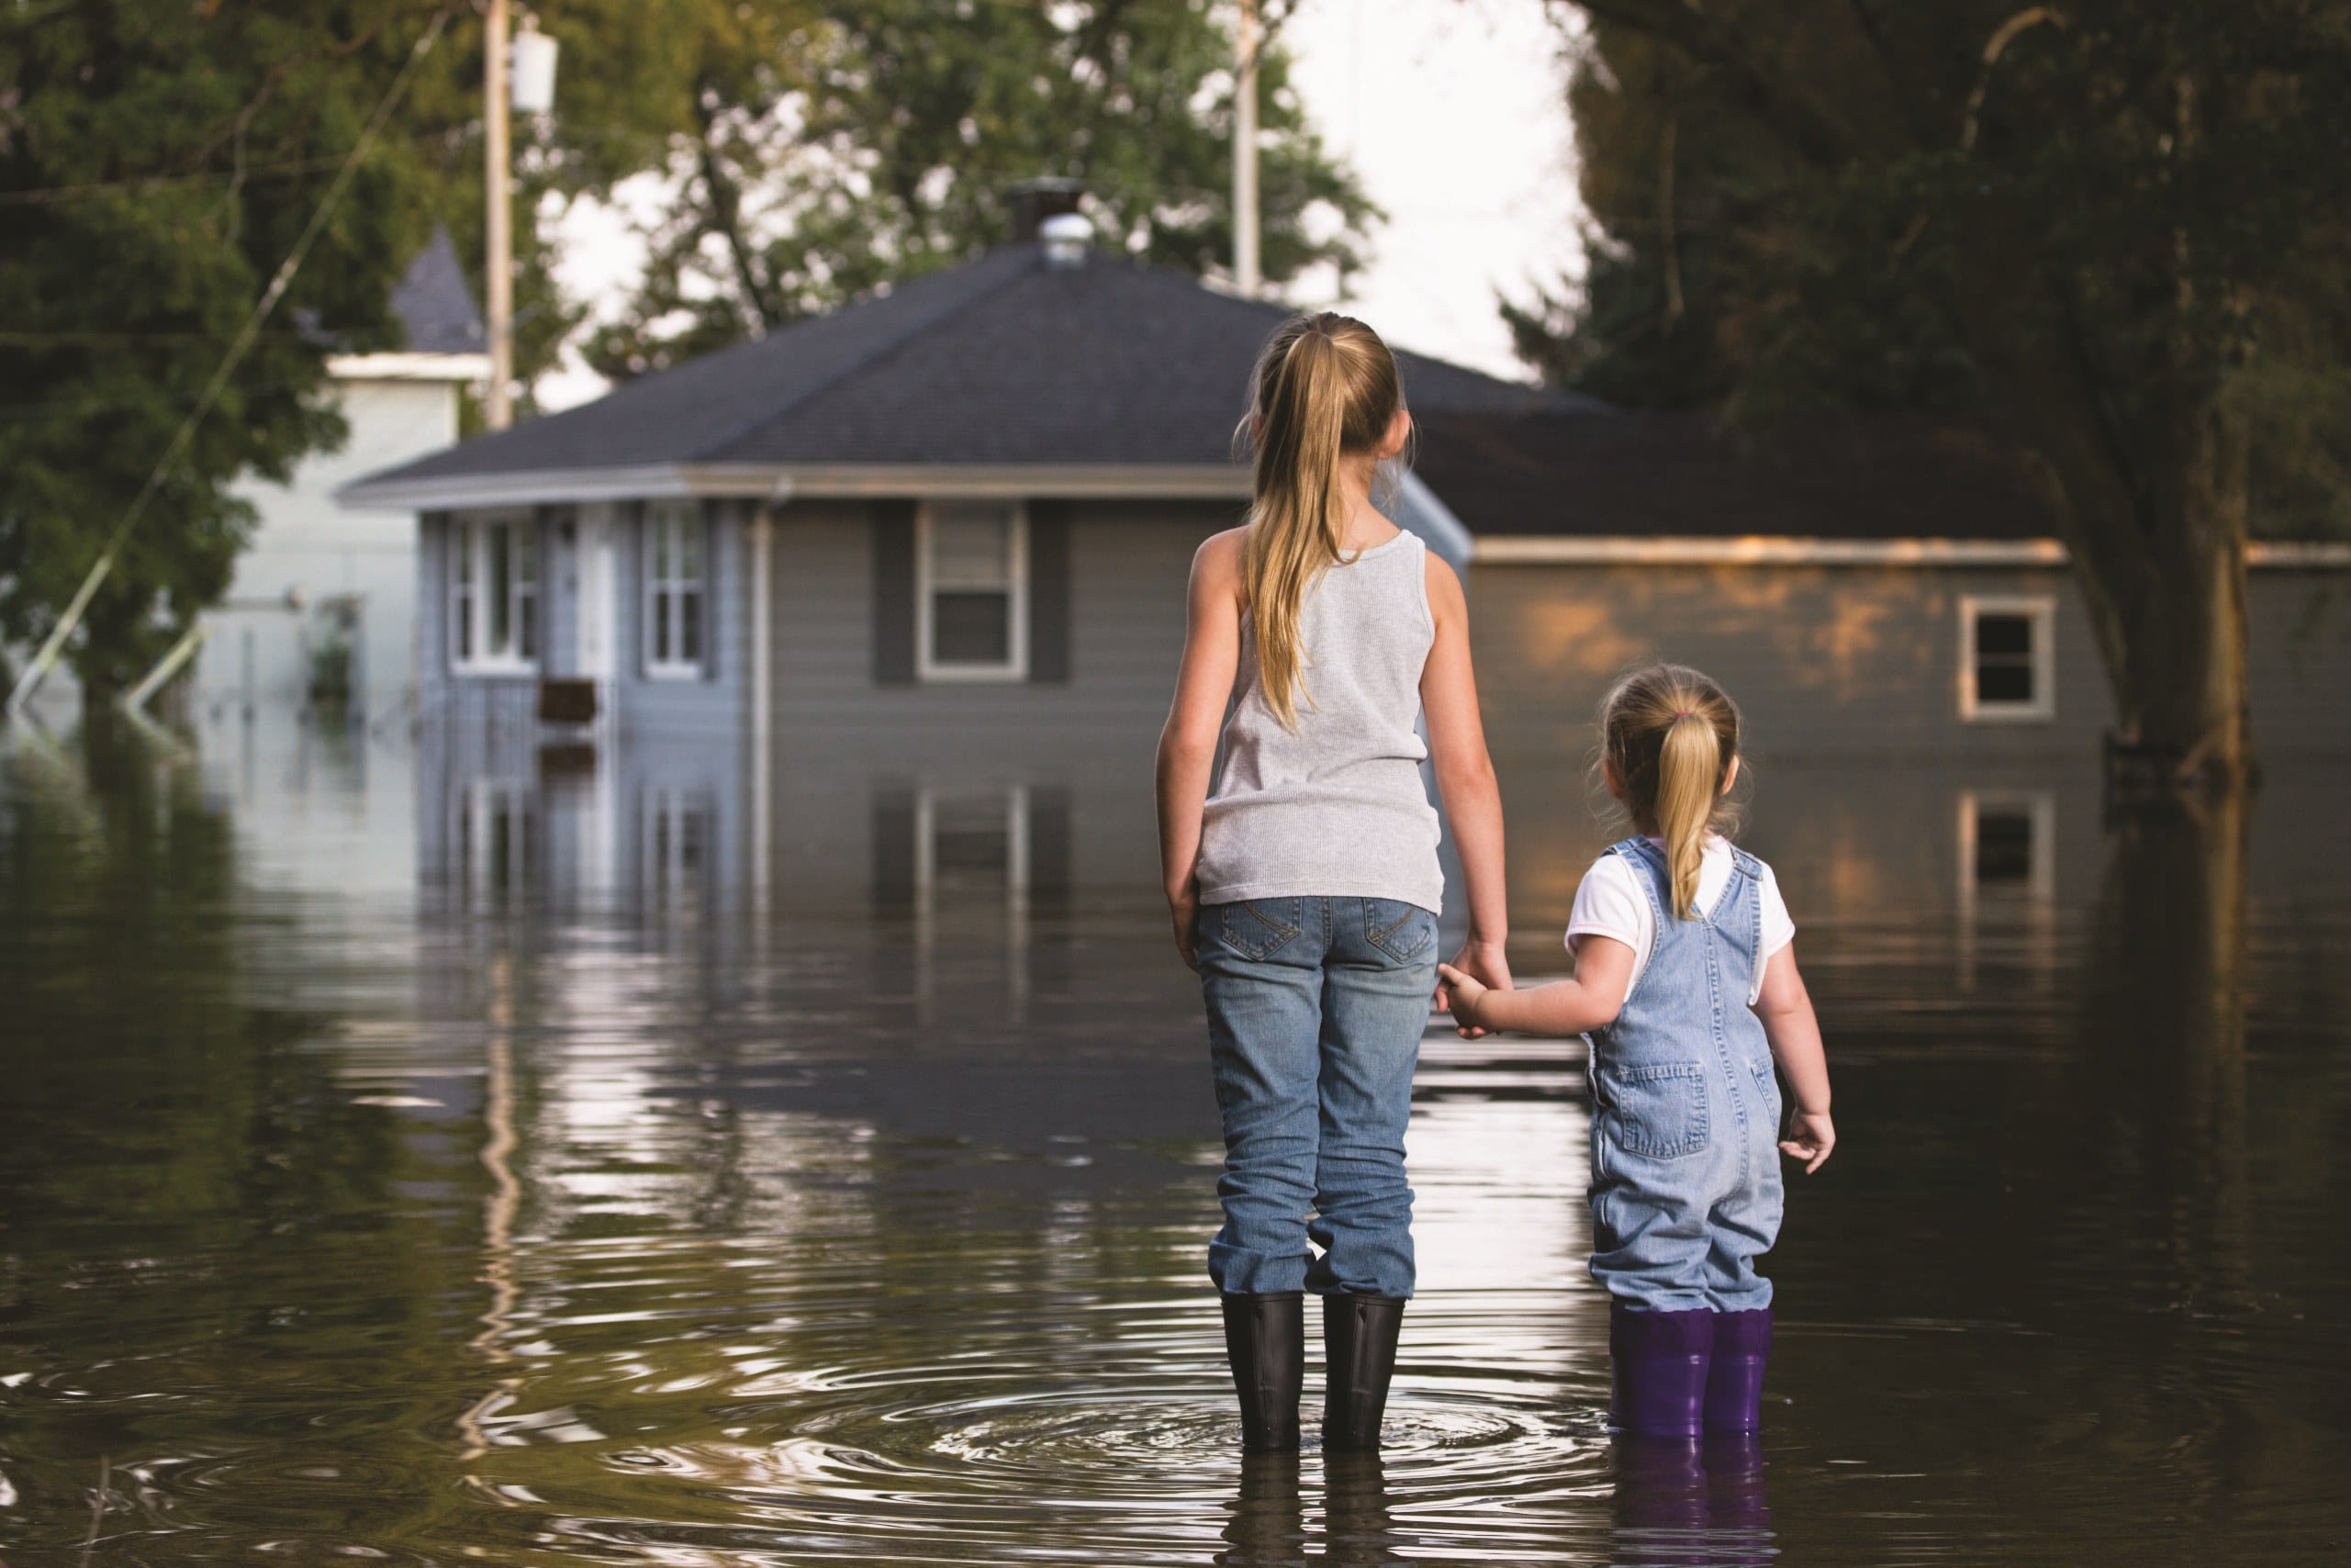 London Ontario flood damage repair